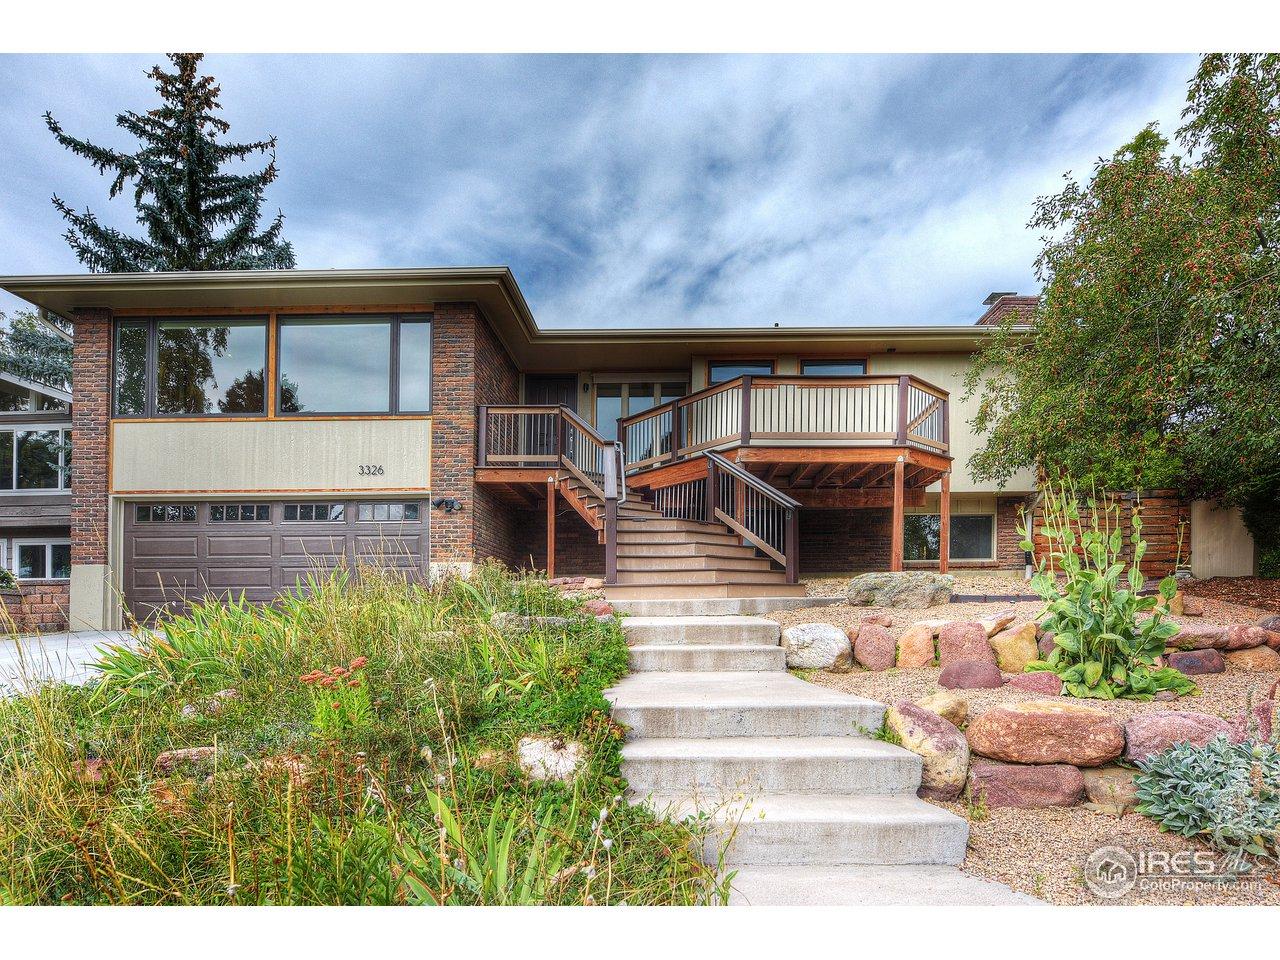 3326 Loyola Ct, Boulder CO 80305